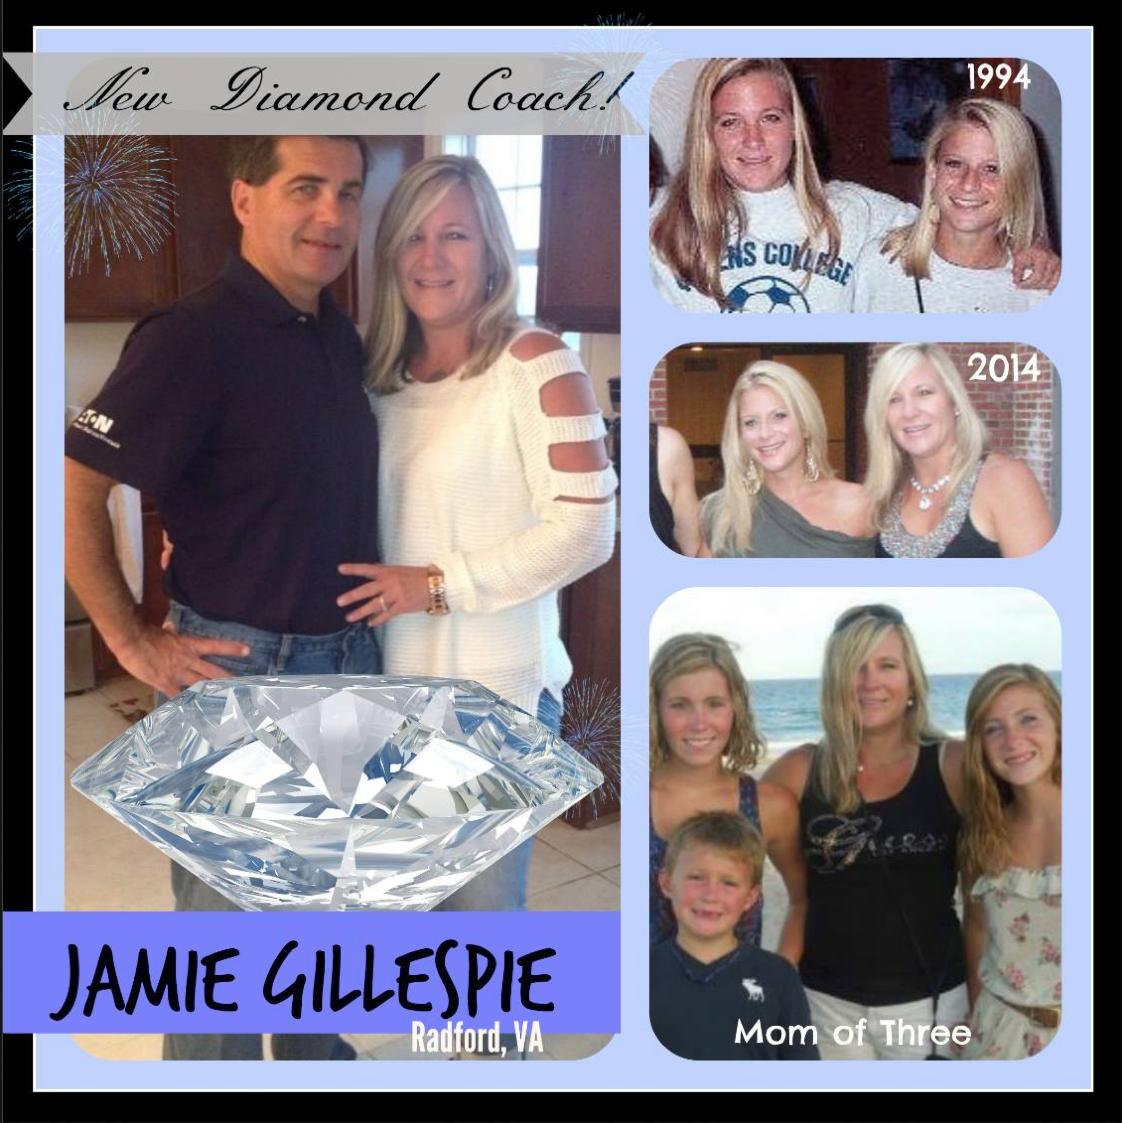 Jamie Gillespie